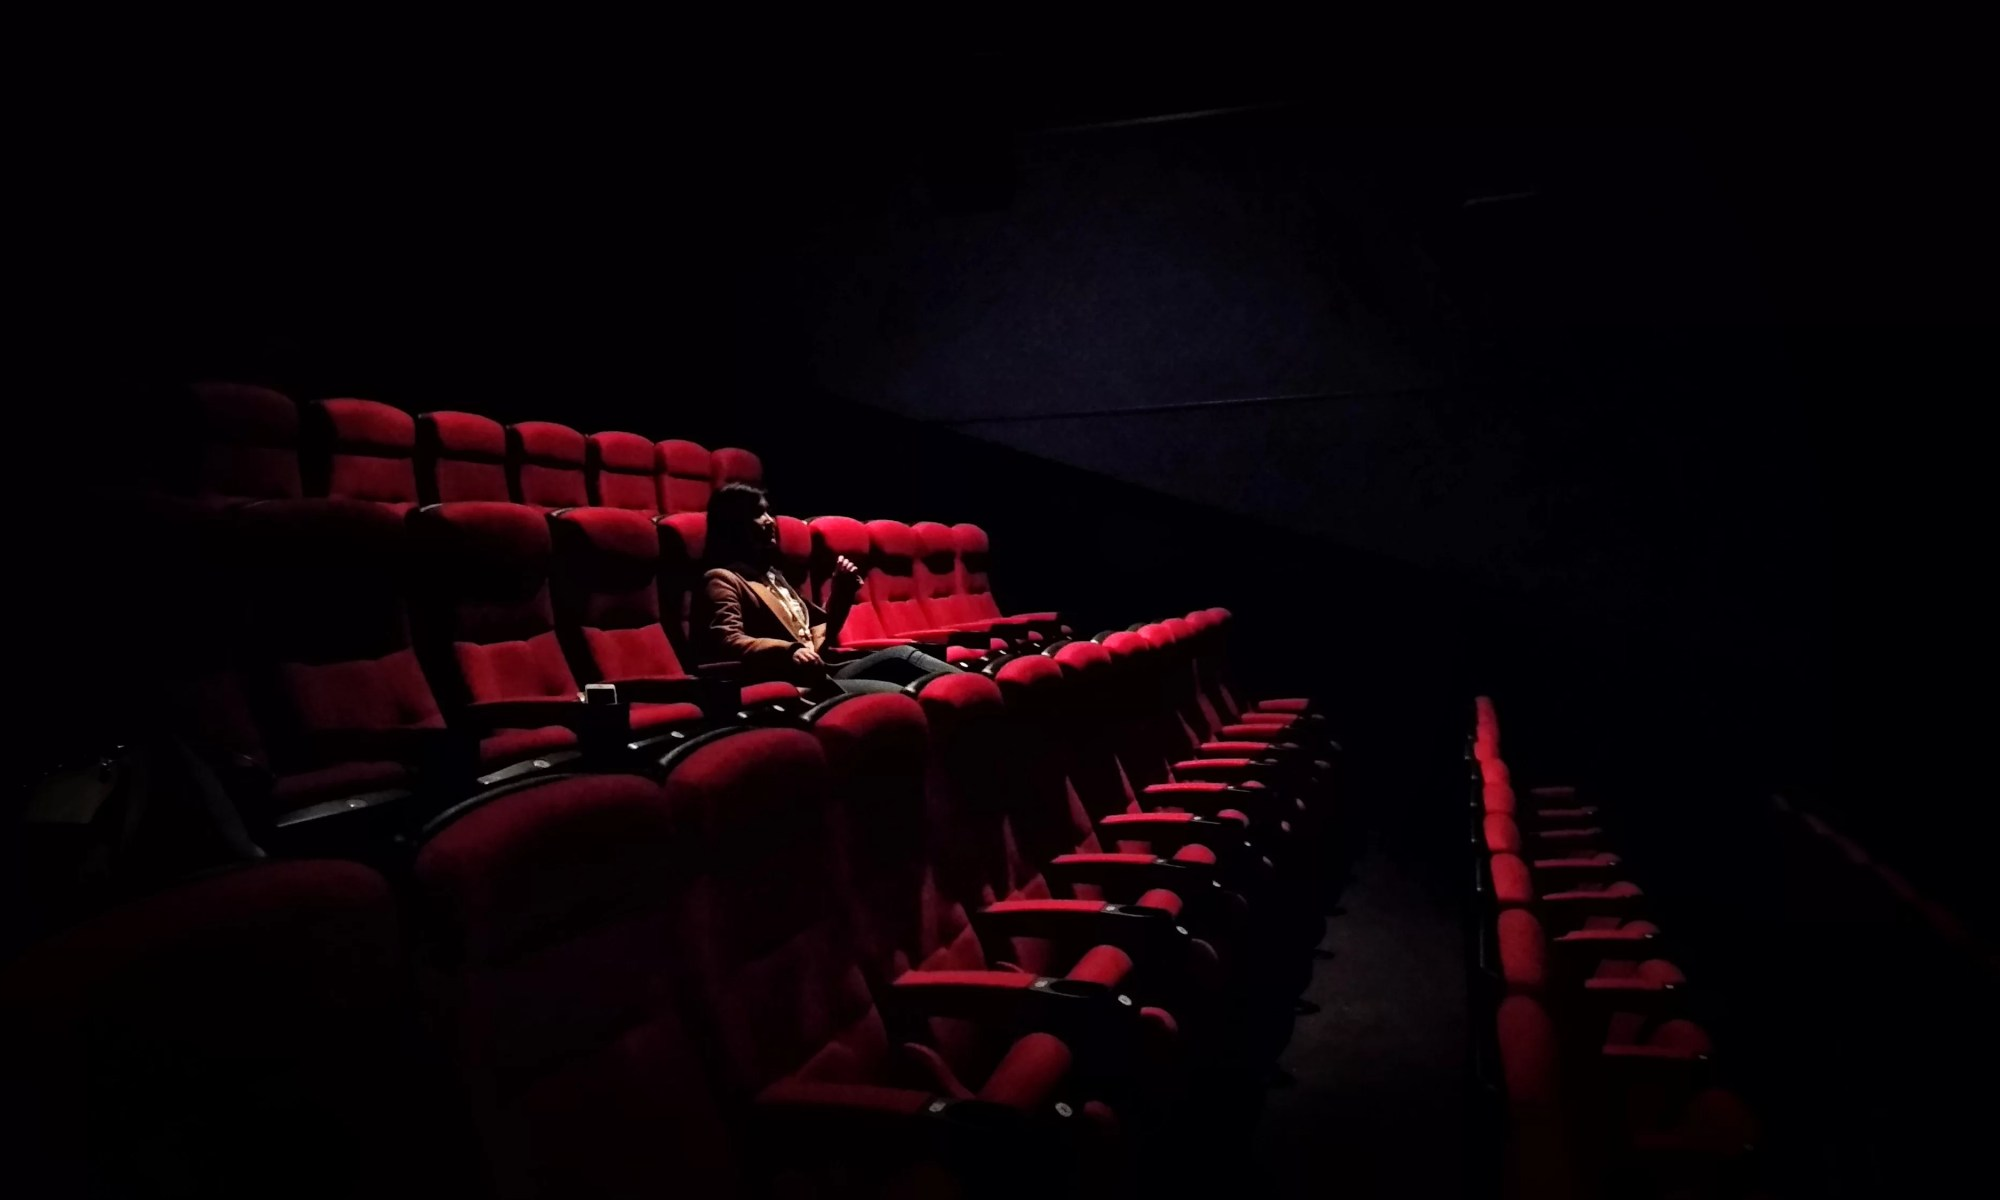 a woman sits alone in a theatre auditorium